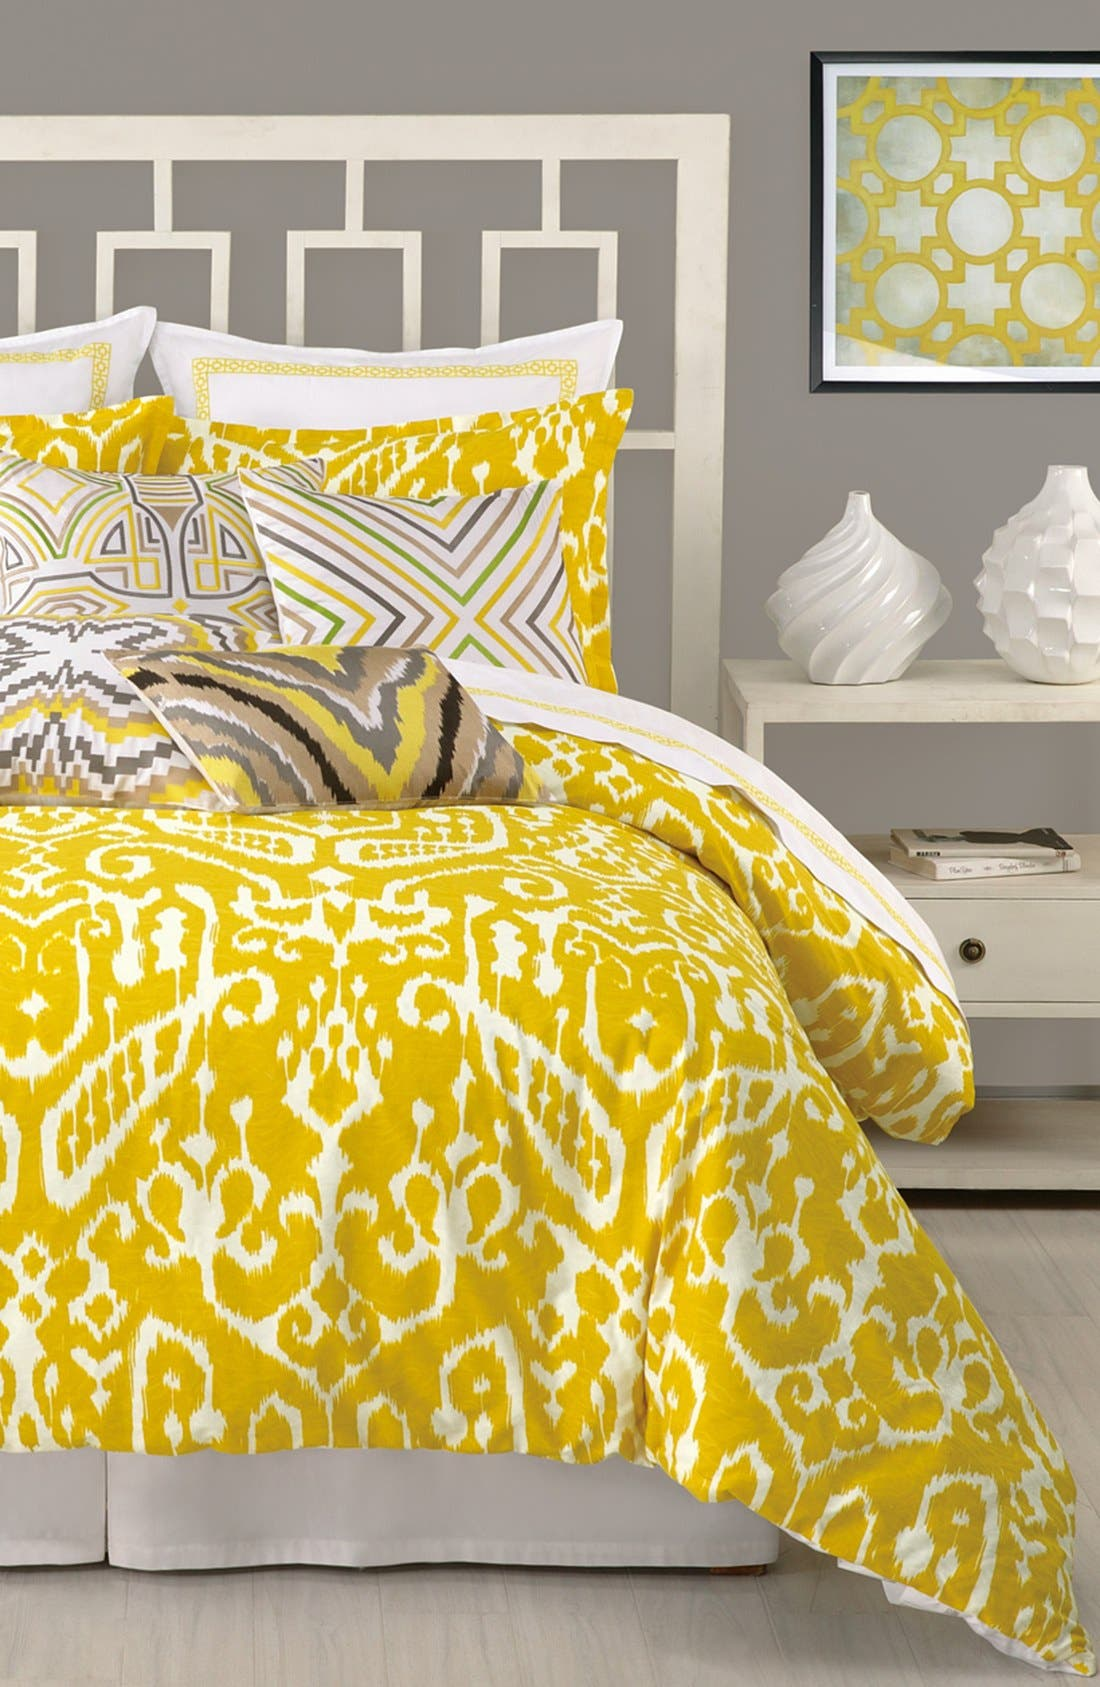 Main Image - Trina Turk 'Ikat' Comforter & Shams